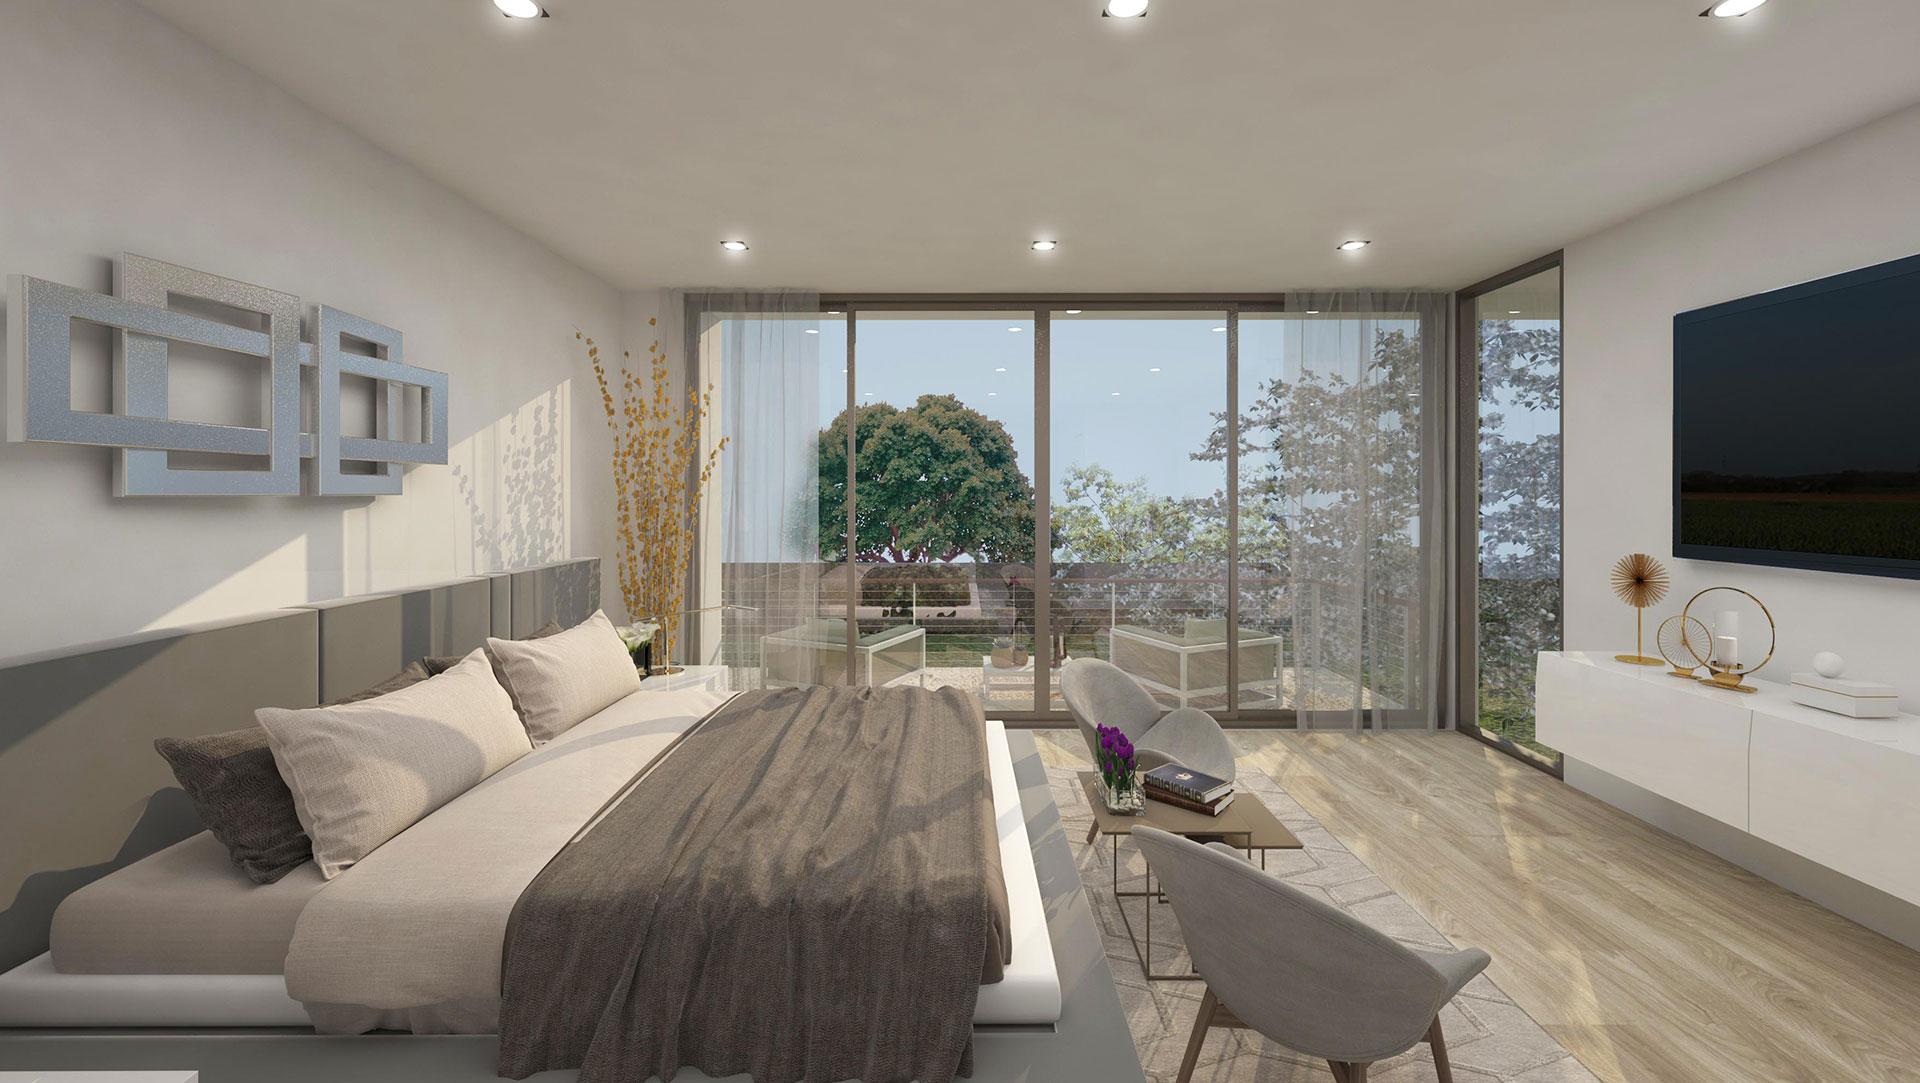 Interior Design bedroom project in Douglas RD, Florida